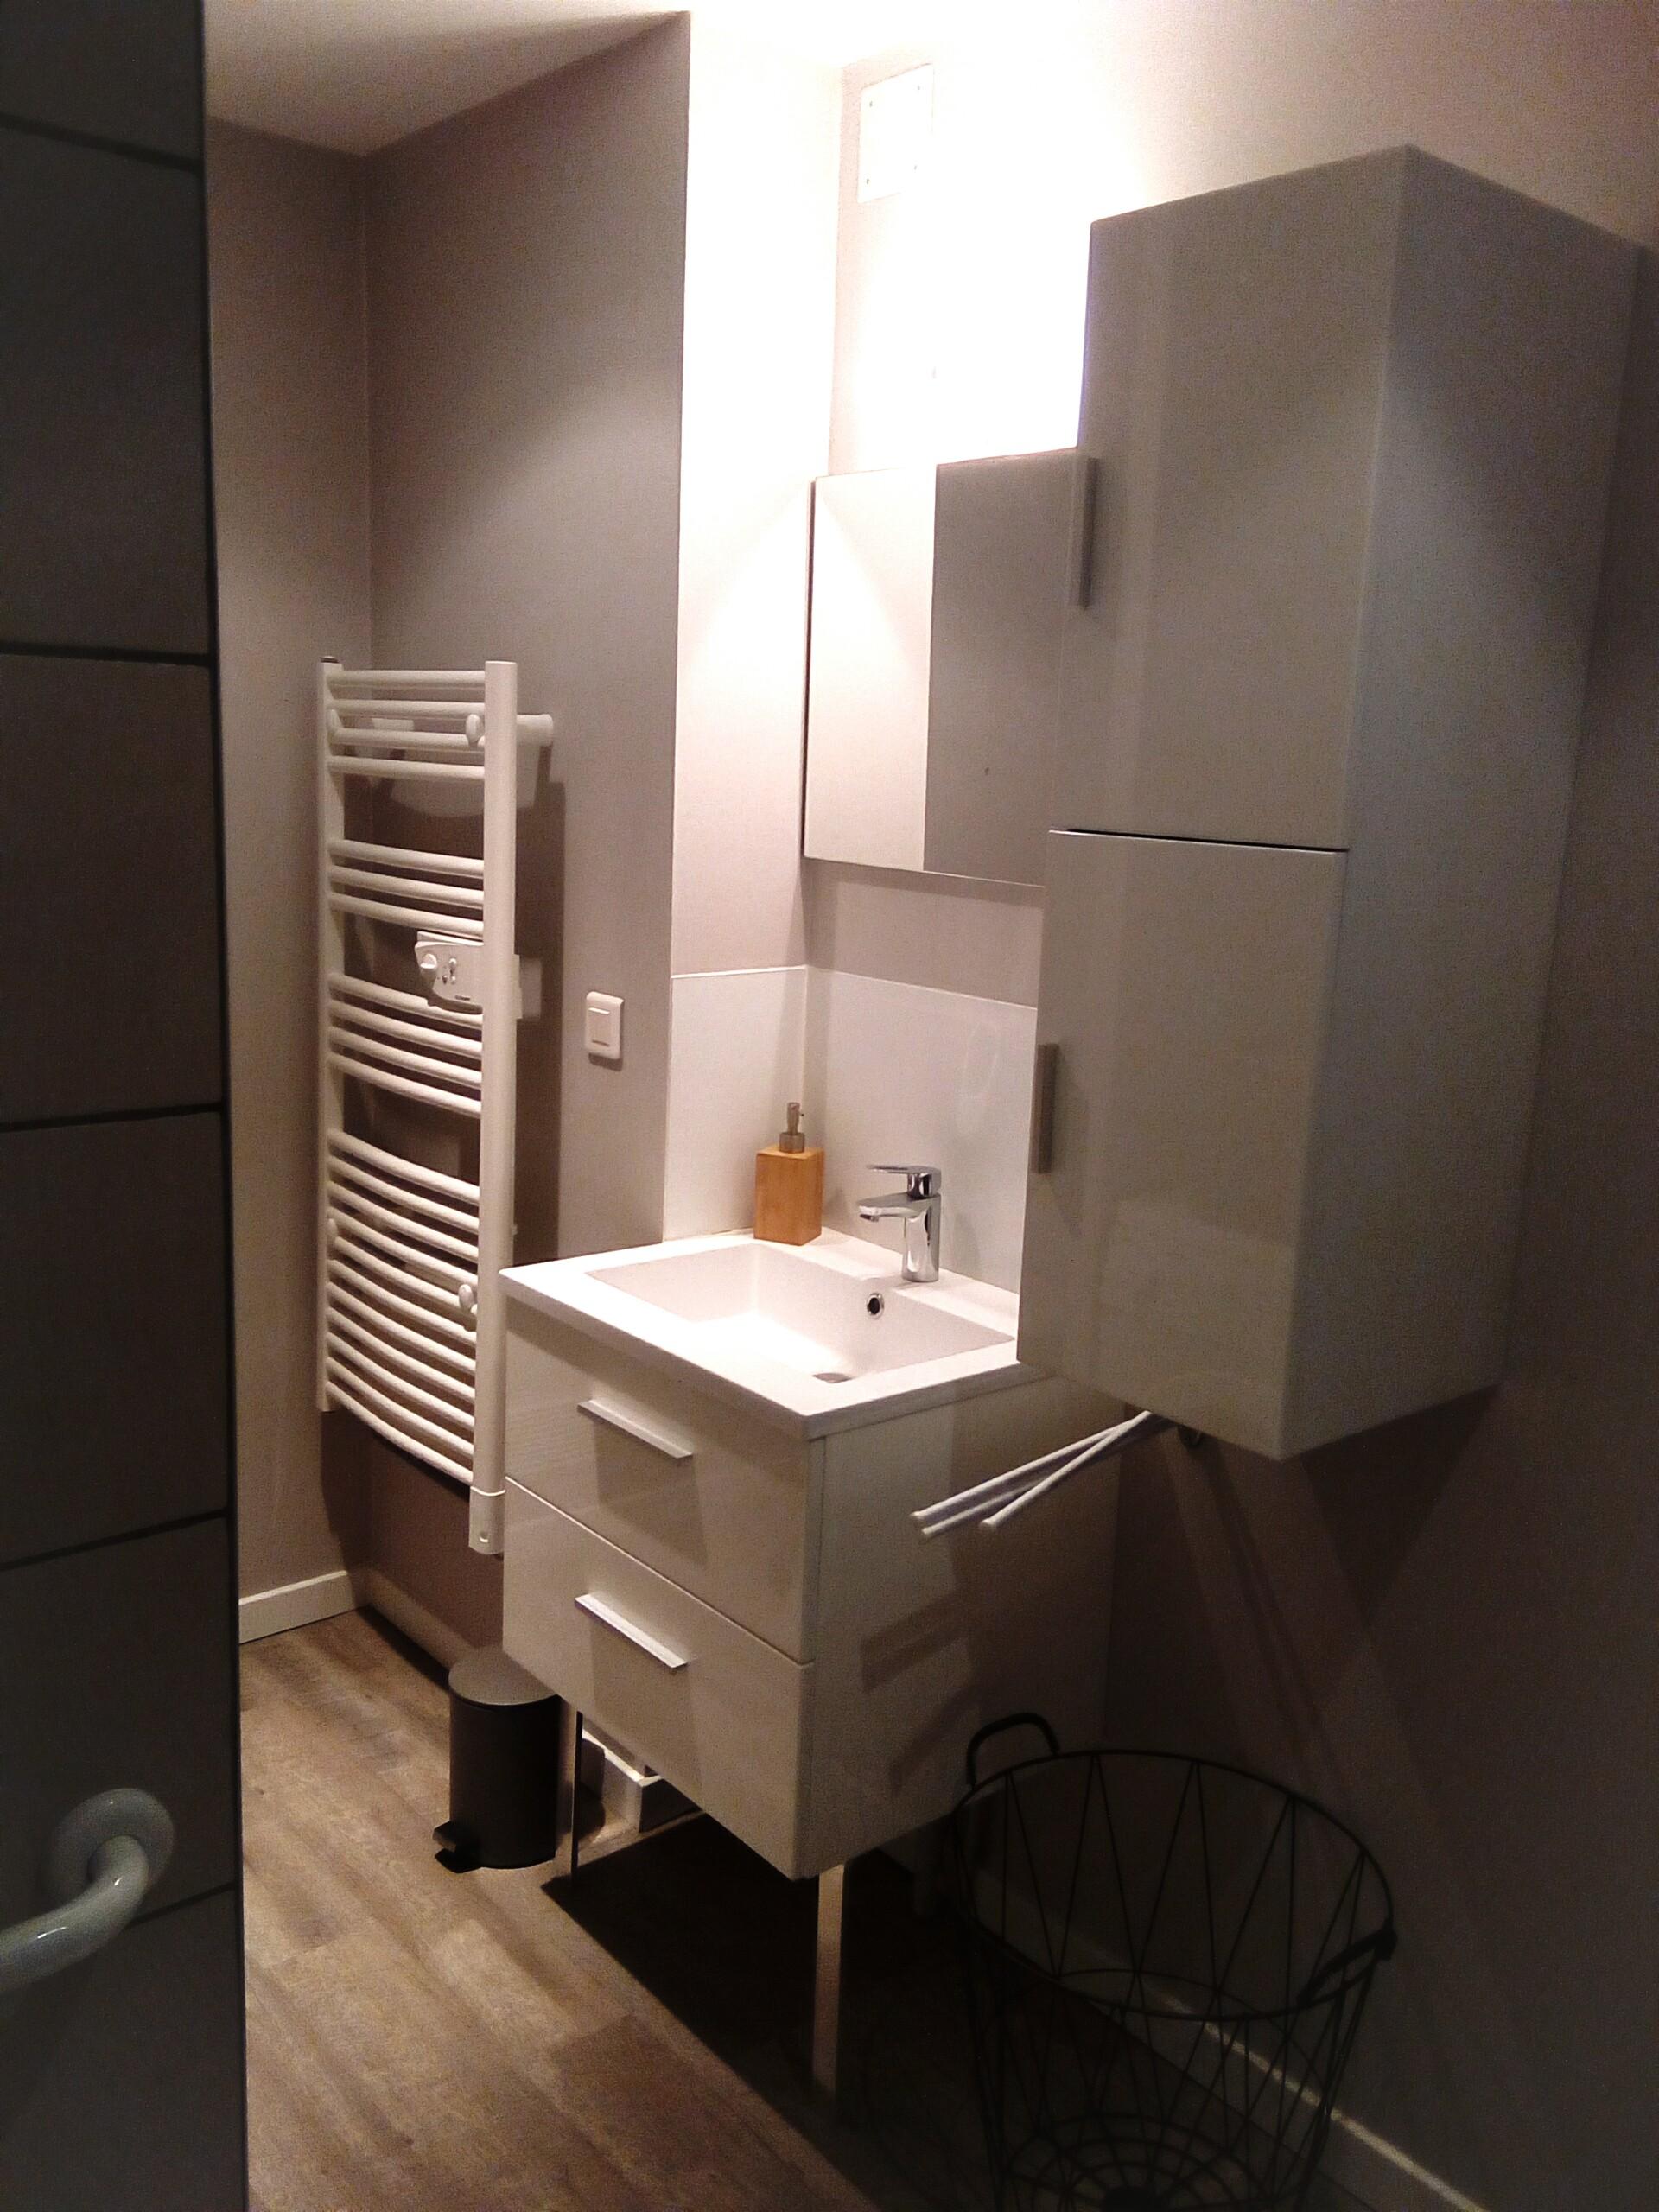 Salle de douche - A.Brun